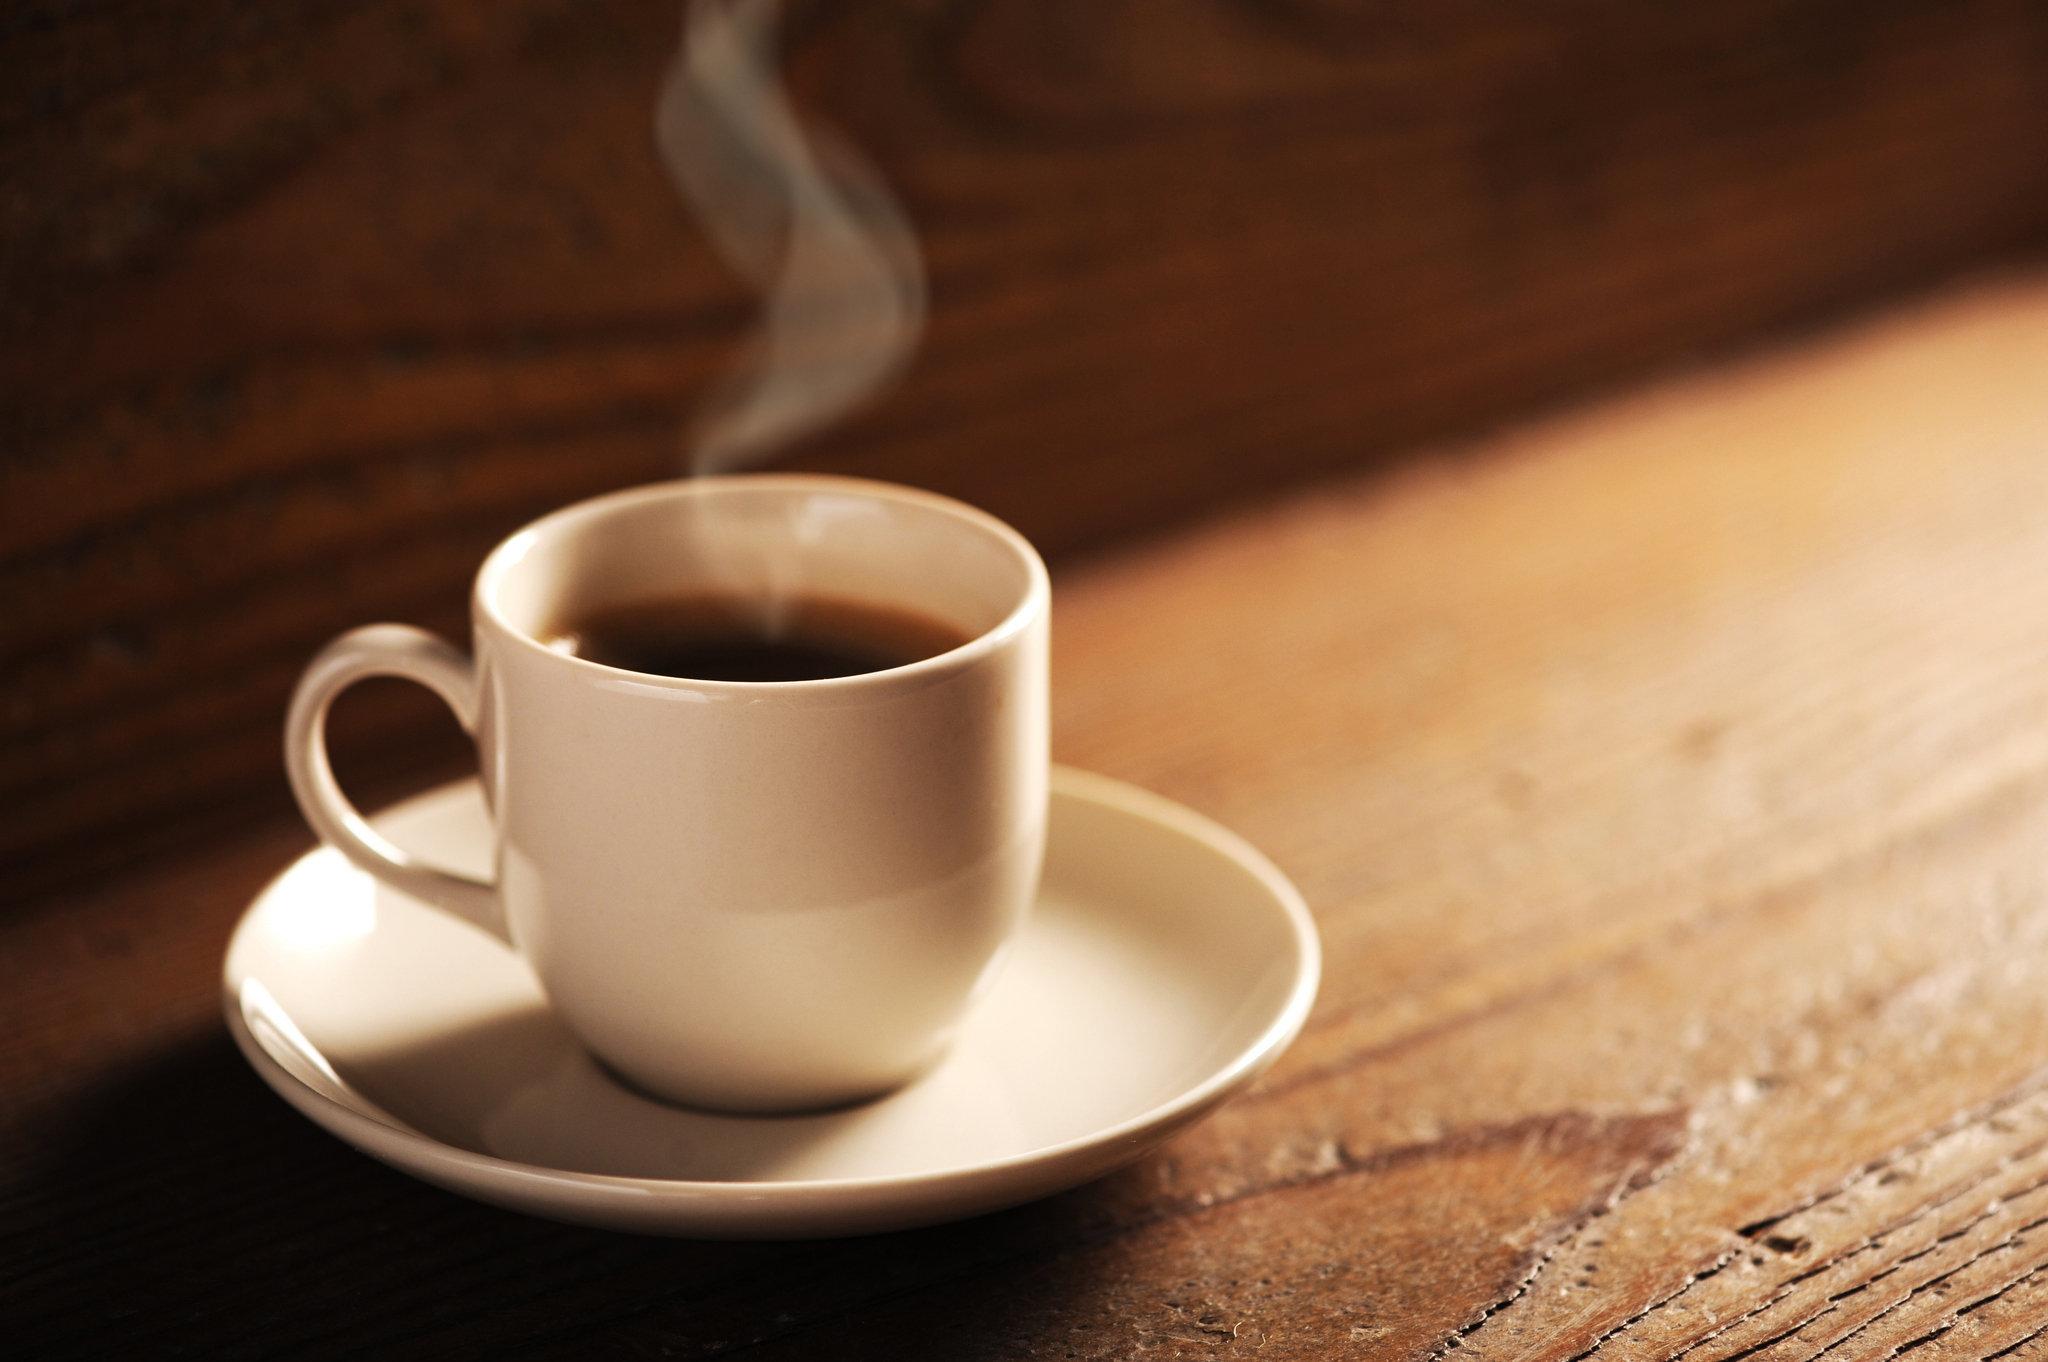 nepijte ranni kavu na prazdny zaludek_casnazdravejidlo_cz